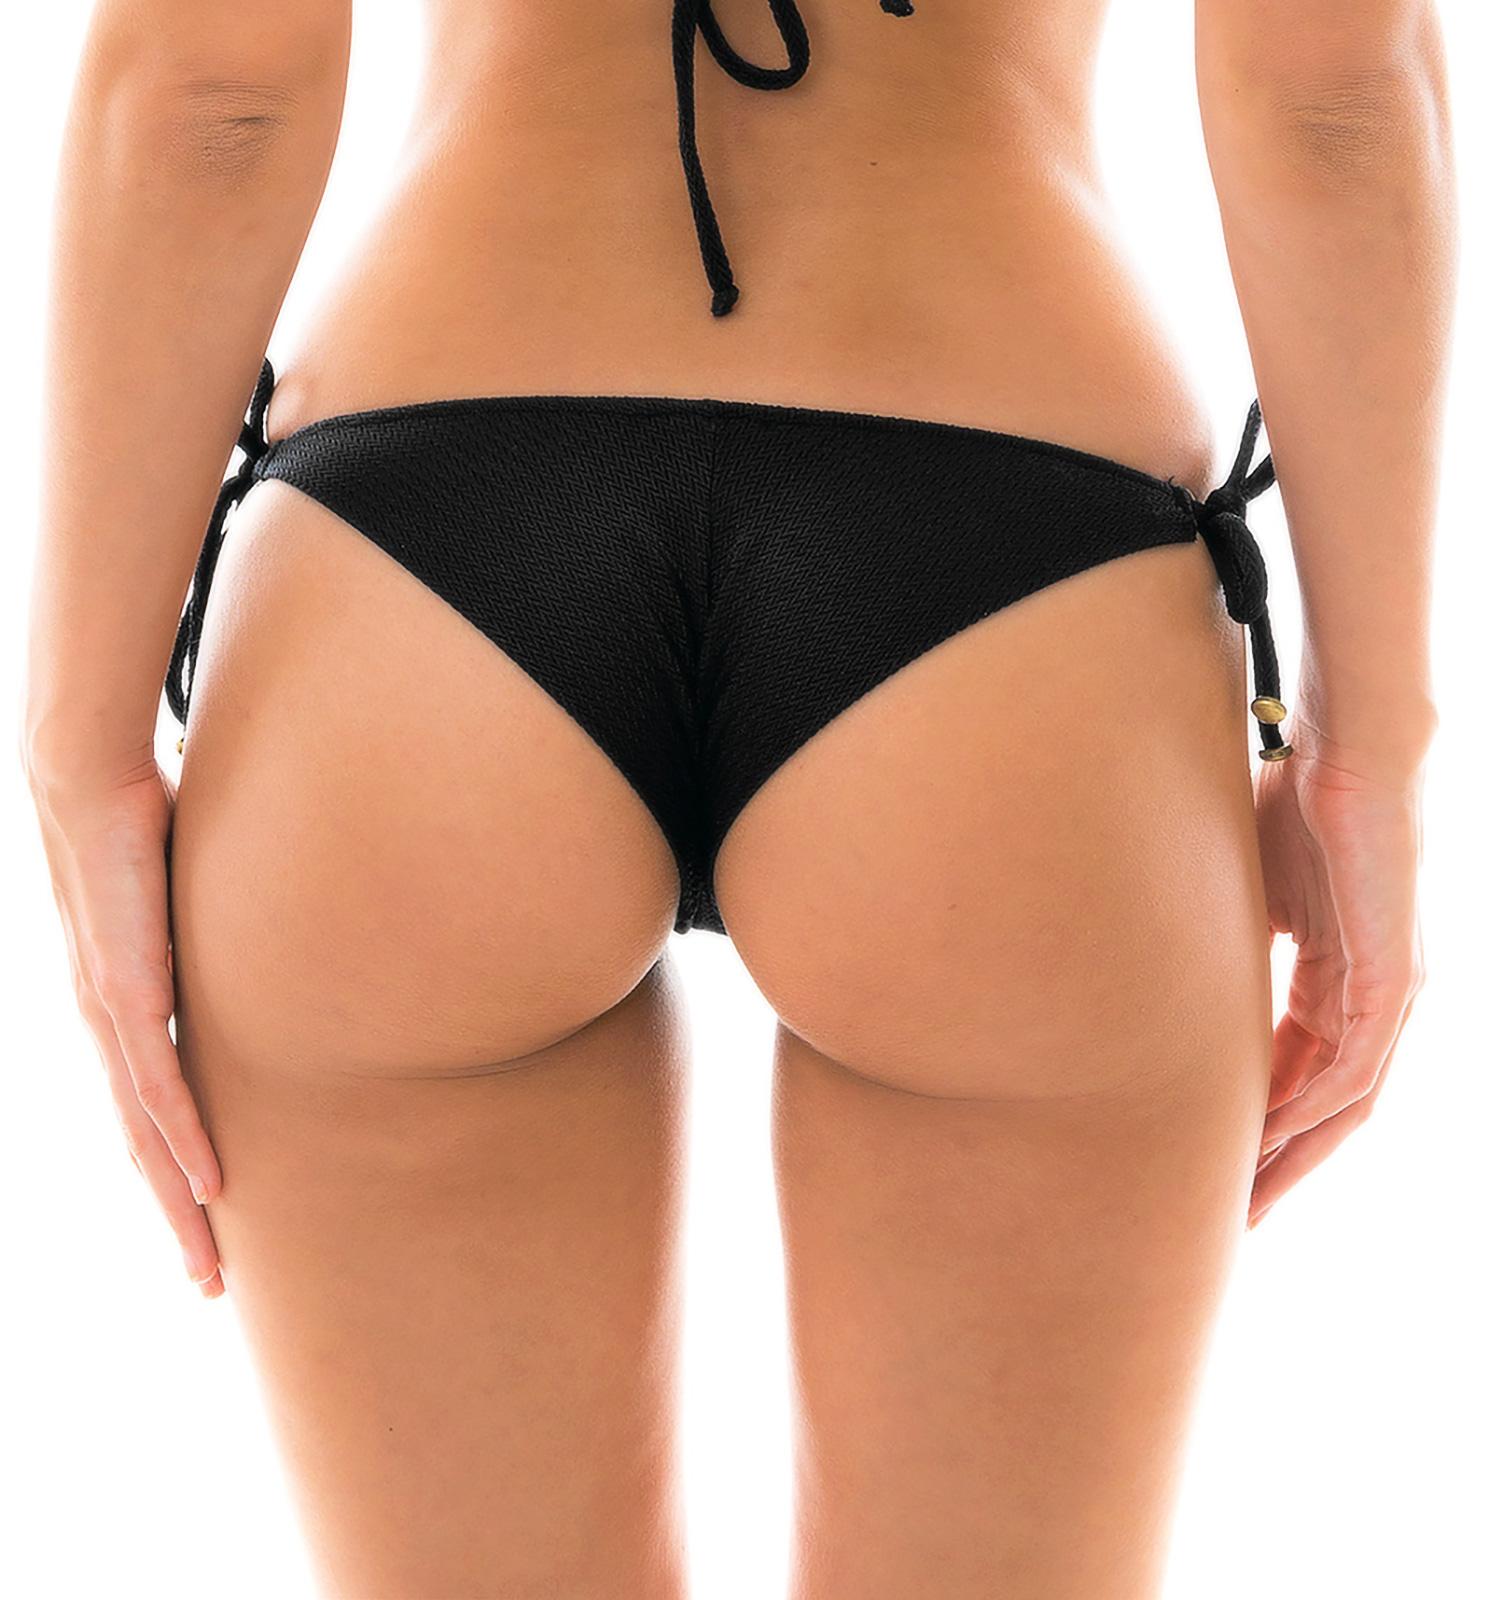 34eb96d6b3 ... Textured and accessorized black bikini bottom - BOTTOM DUNA TRI PRETO  ...